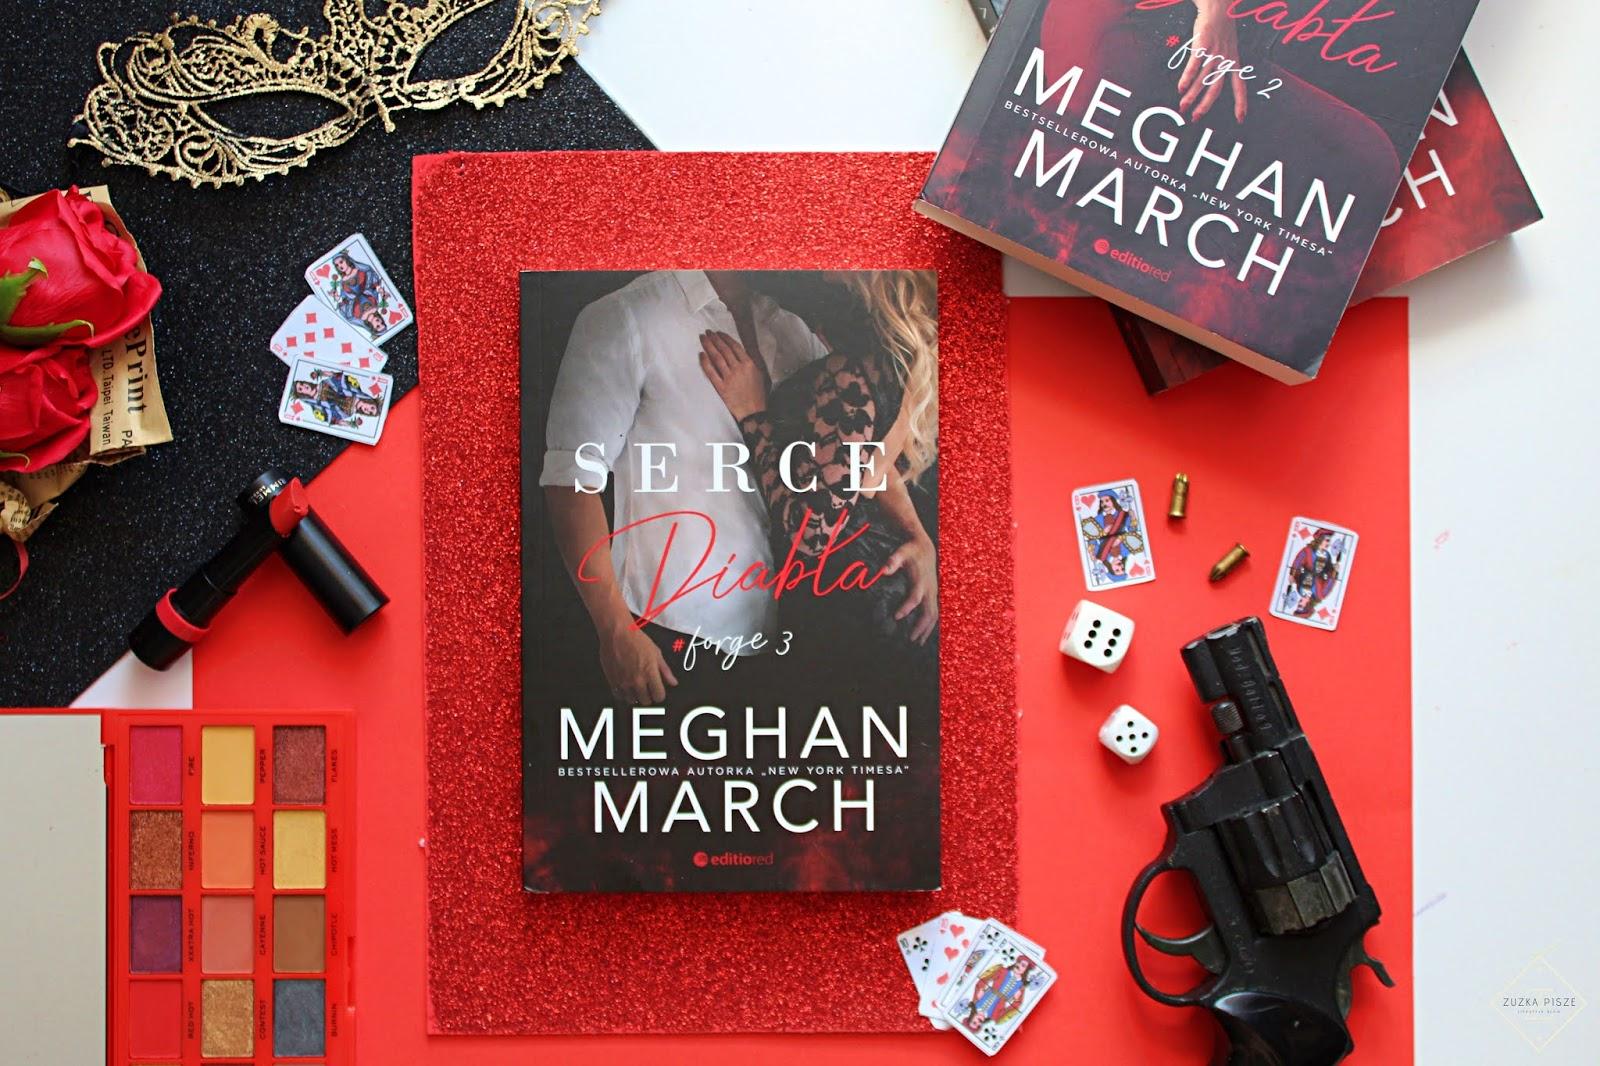 "Meghan March ""Serce diabła"" Forge 3 - recenzja książki"